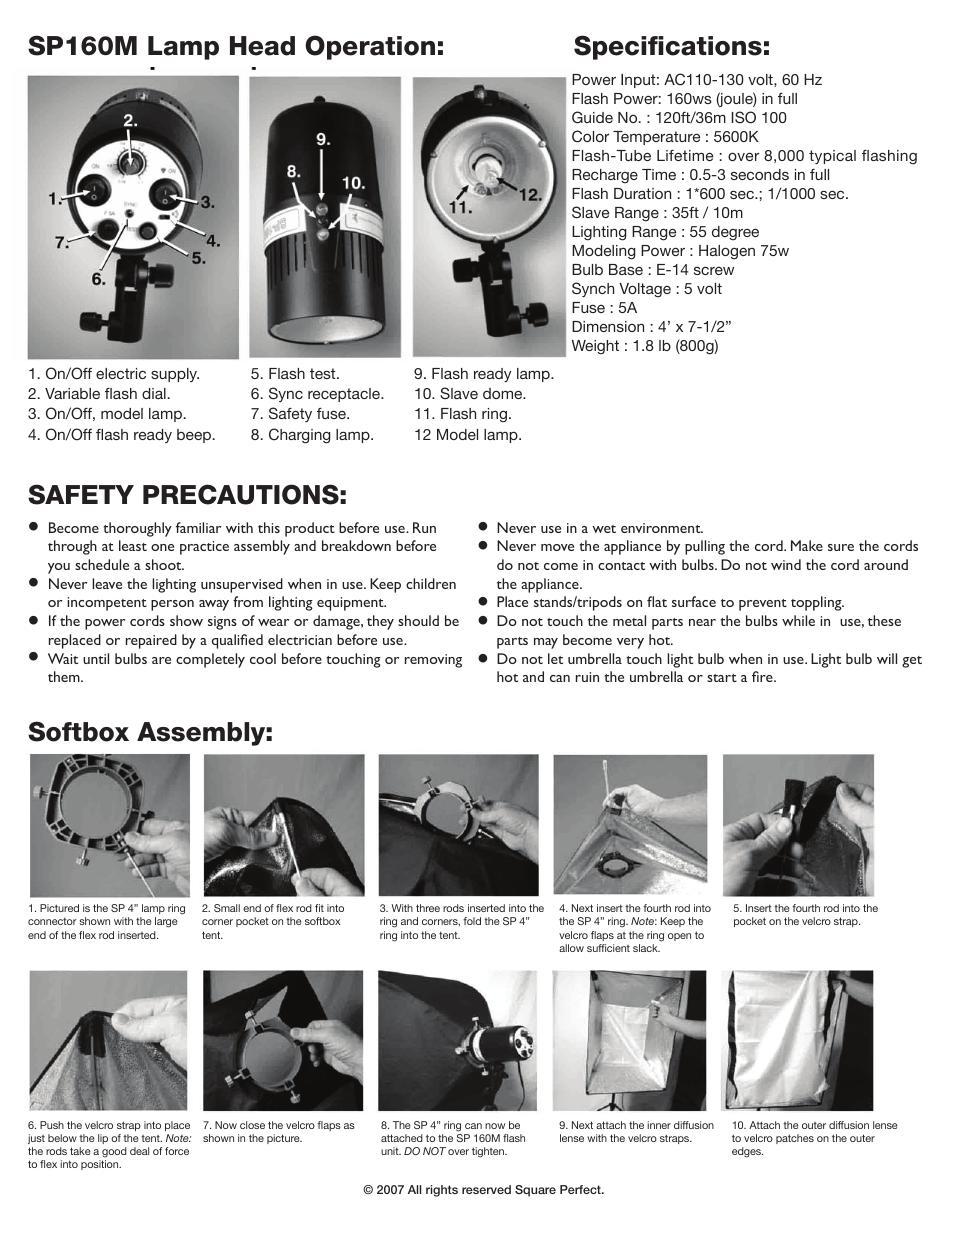 Square Perfect 1002 SP160M Studio Flash Kit User Manual | Page 4 / 5